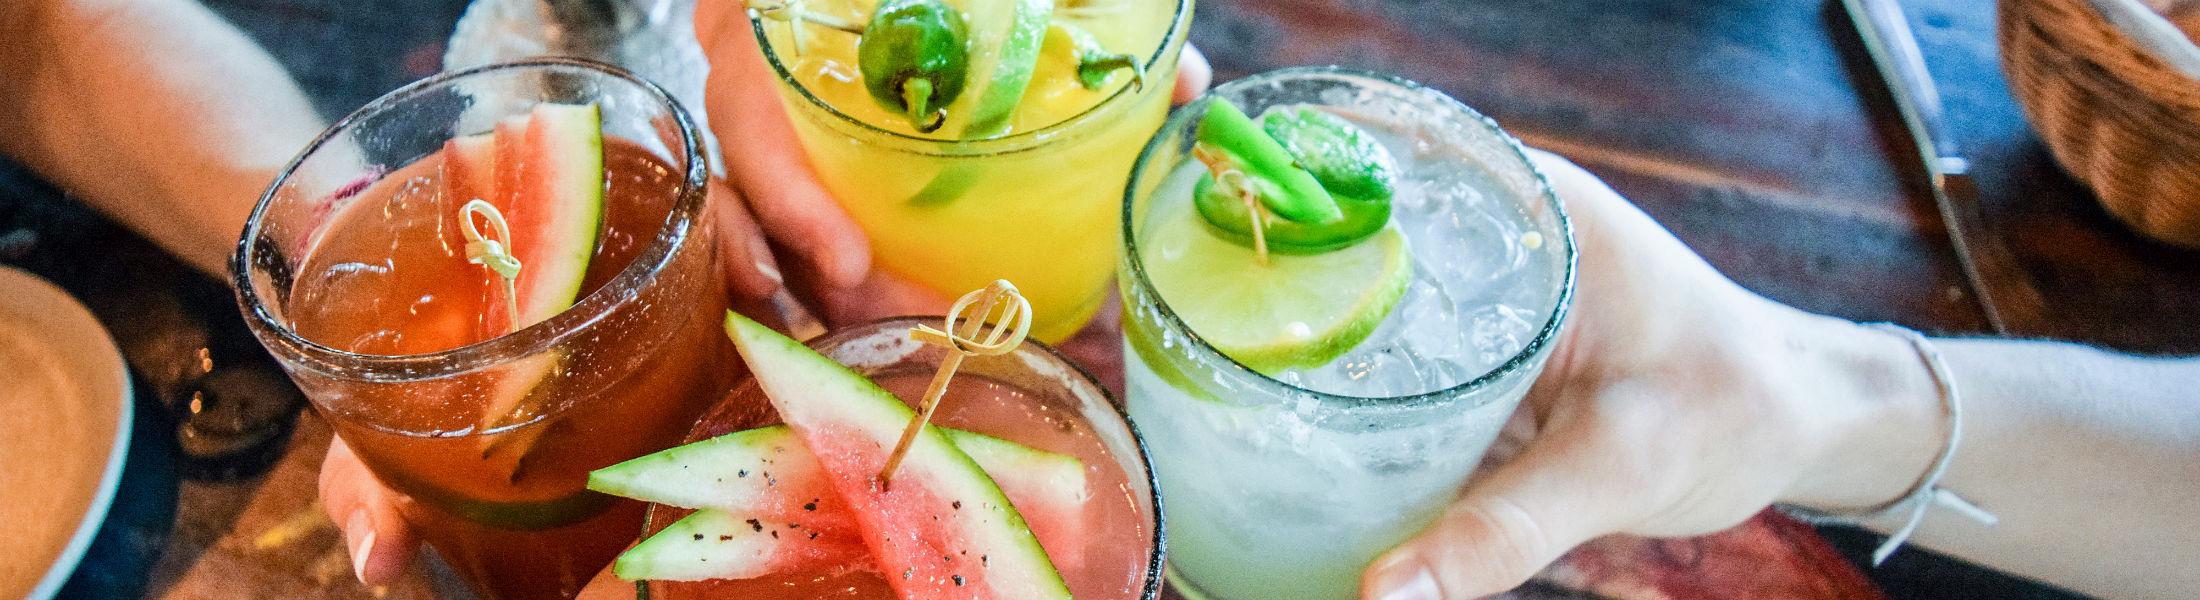 Margaritas in Cancun, Mexico